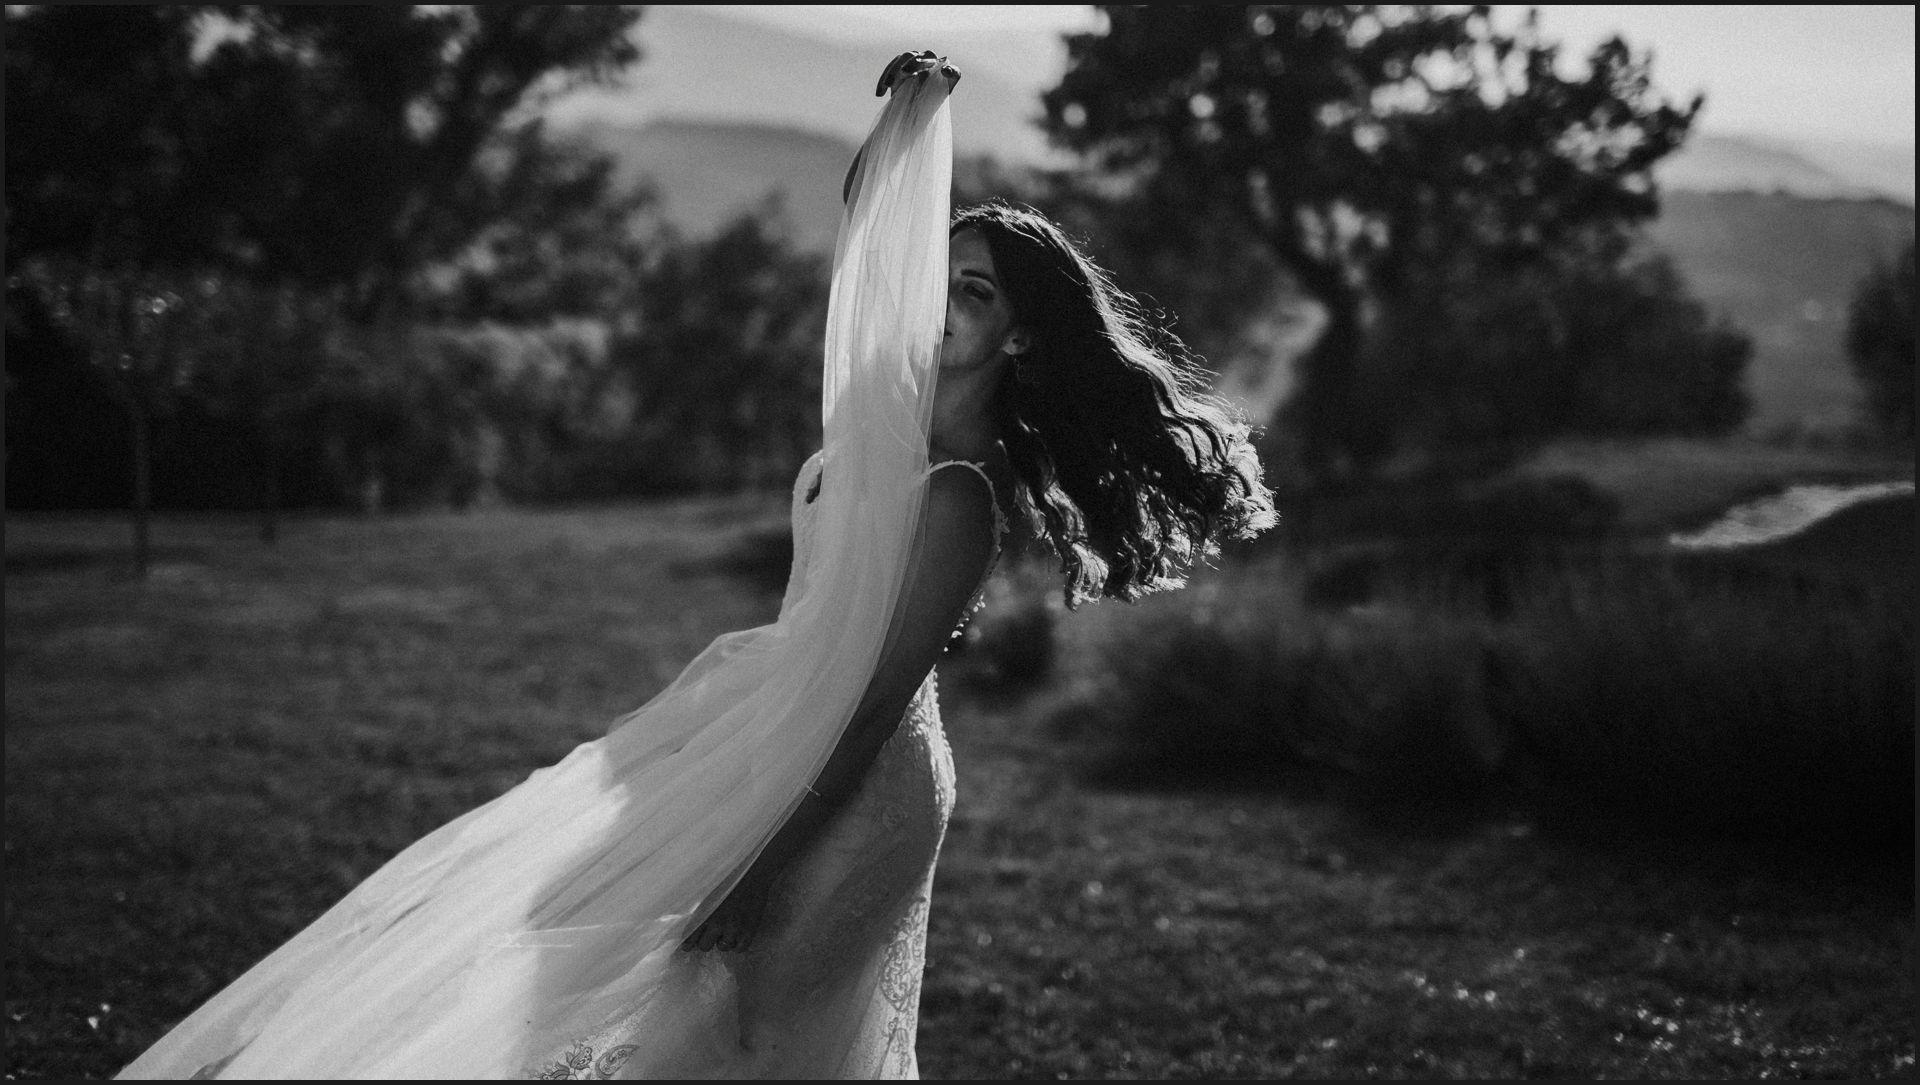 black and white, wedding, umbria, nikis resort, bride, alternative, veil